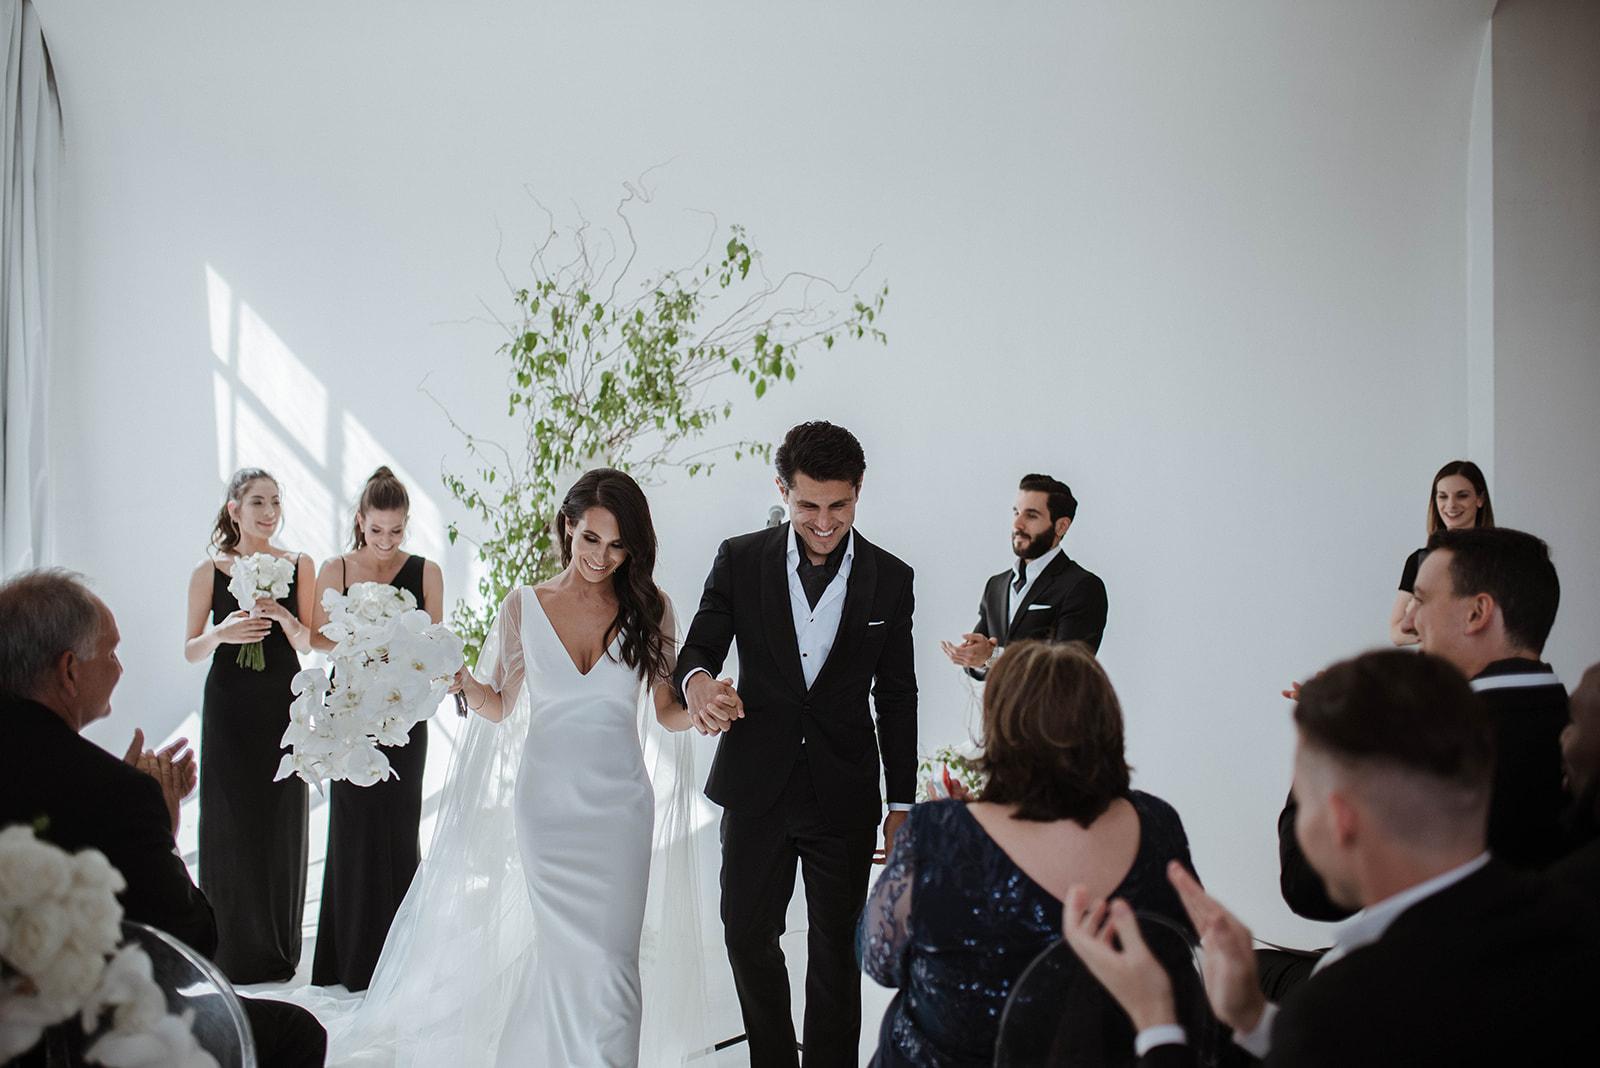 Jenna___Austin_Wedding_Day-_LHP-607.jpg